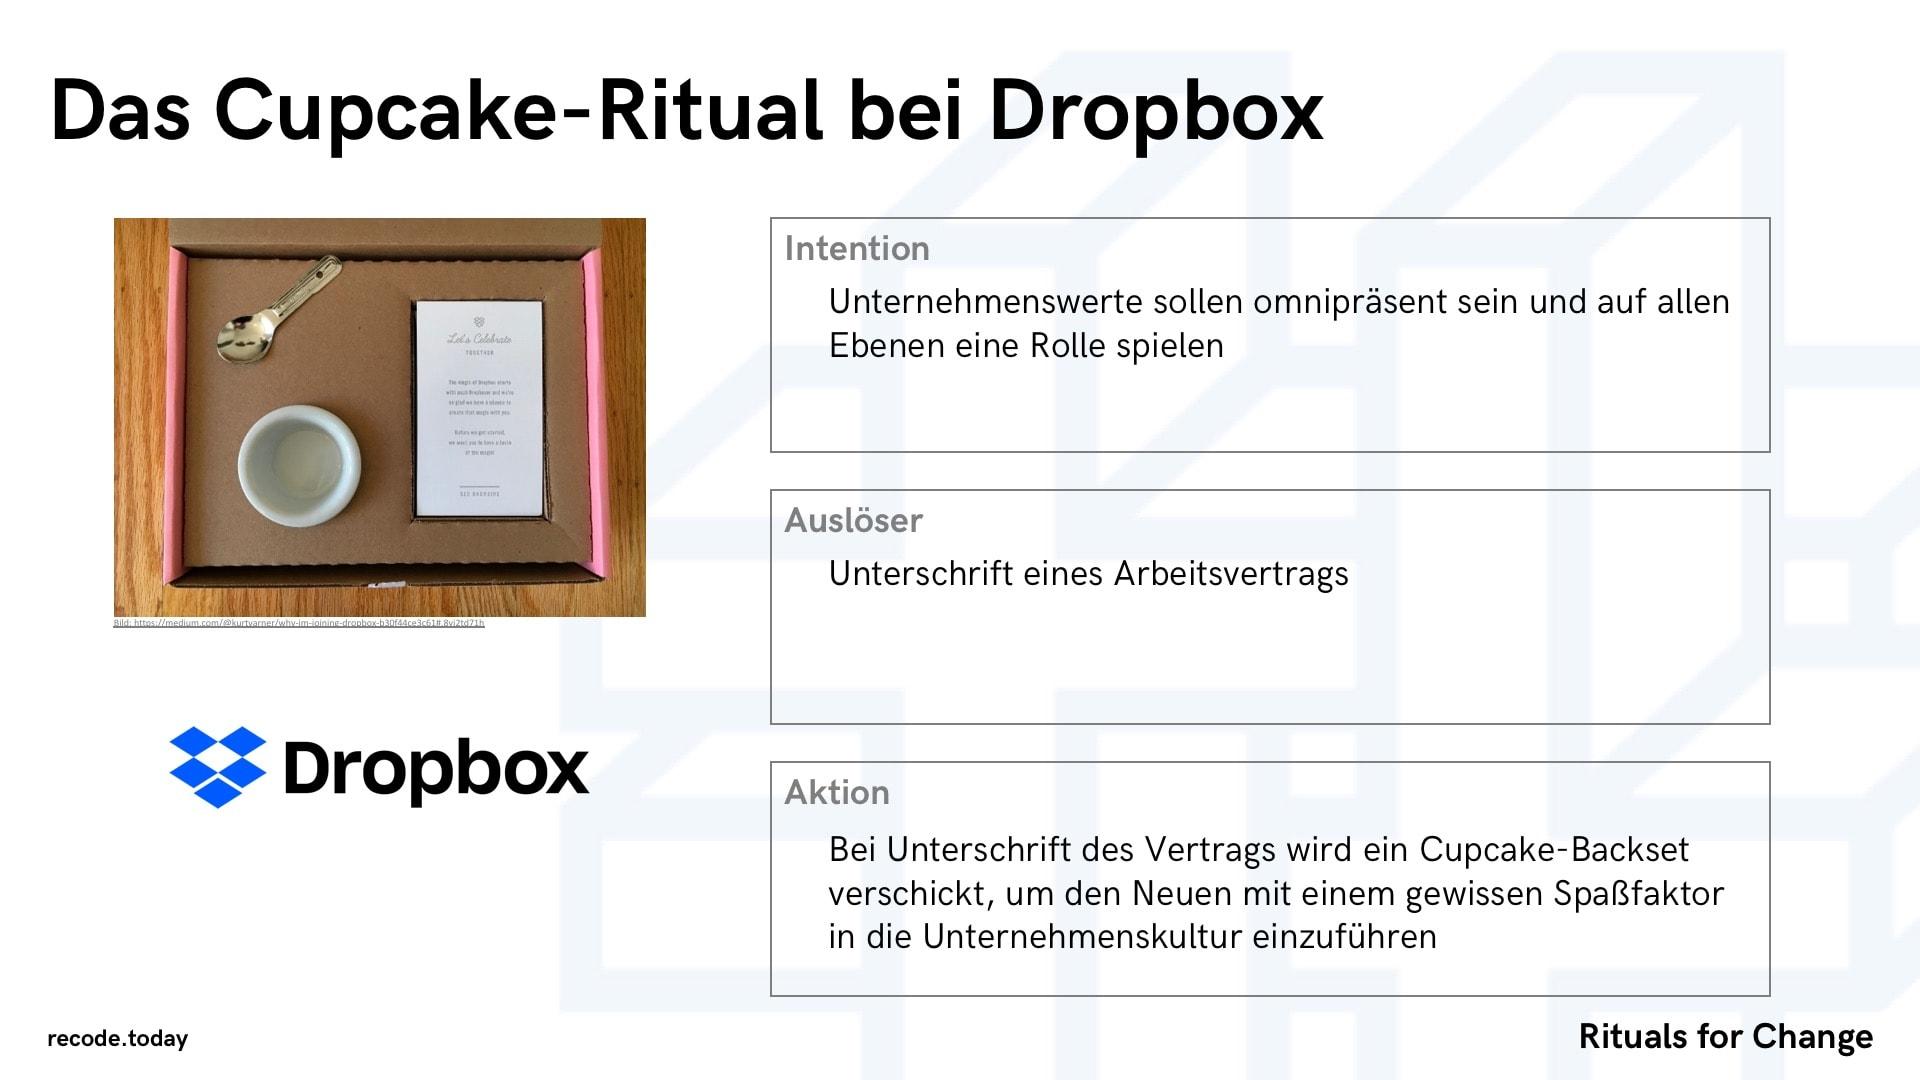 Rituals For Change Veraenderung & Wandel Cupcake Dropbox